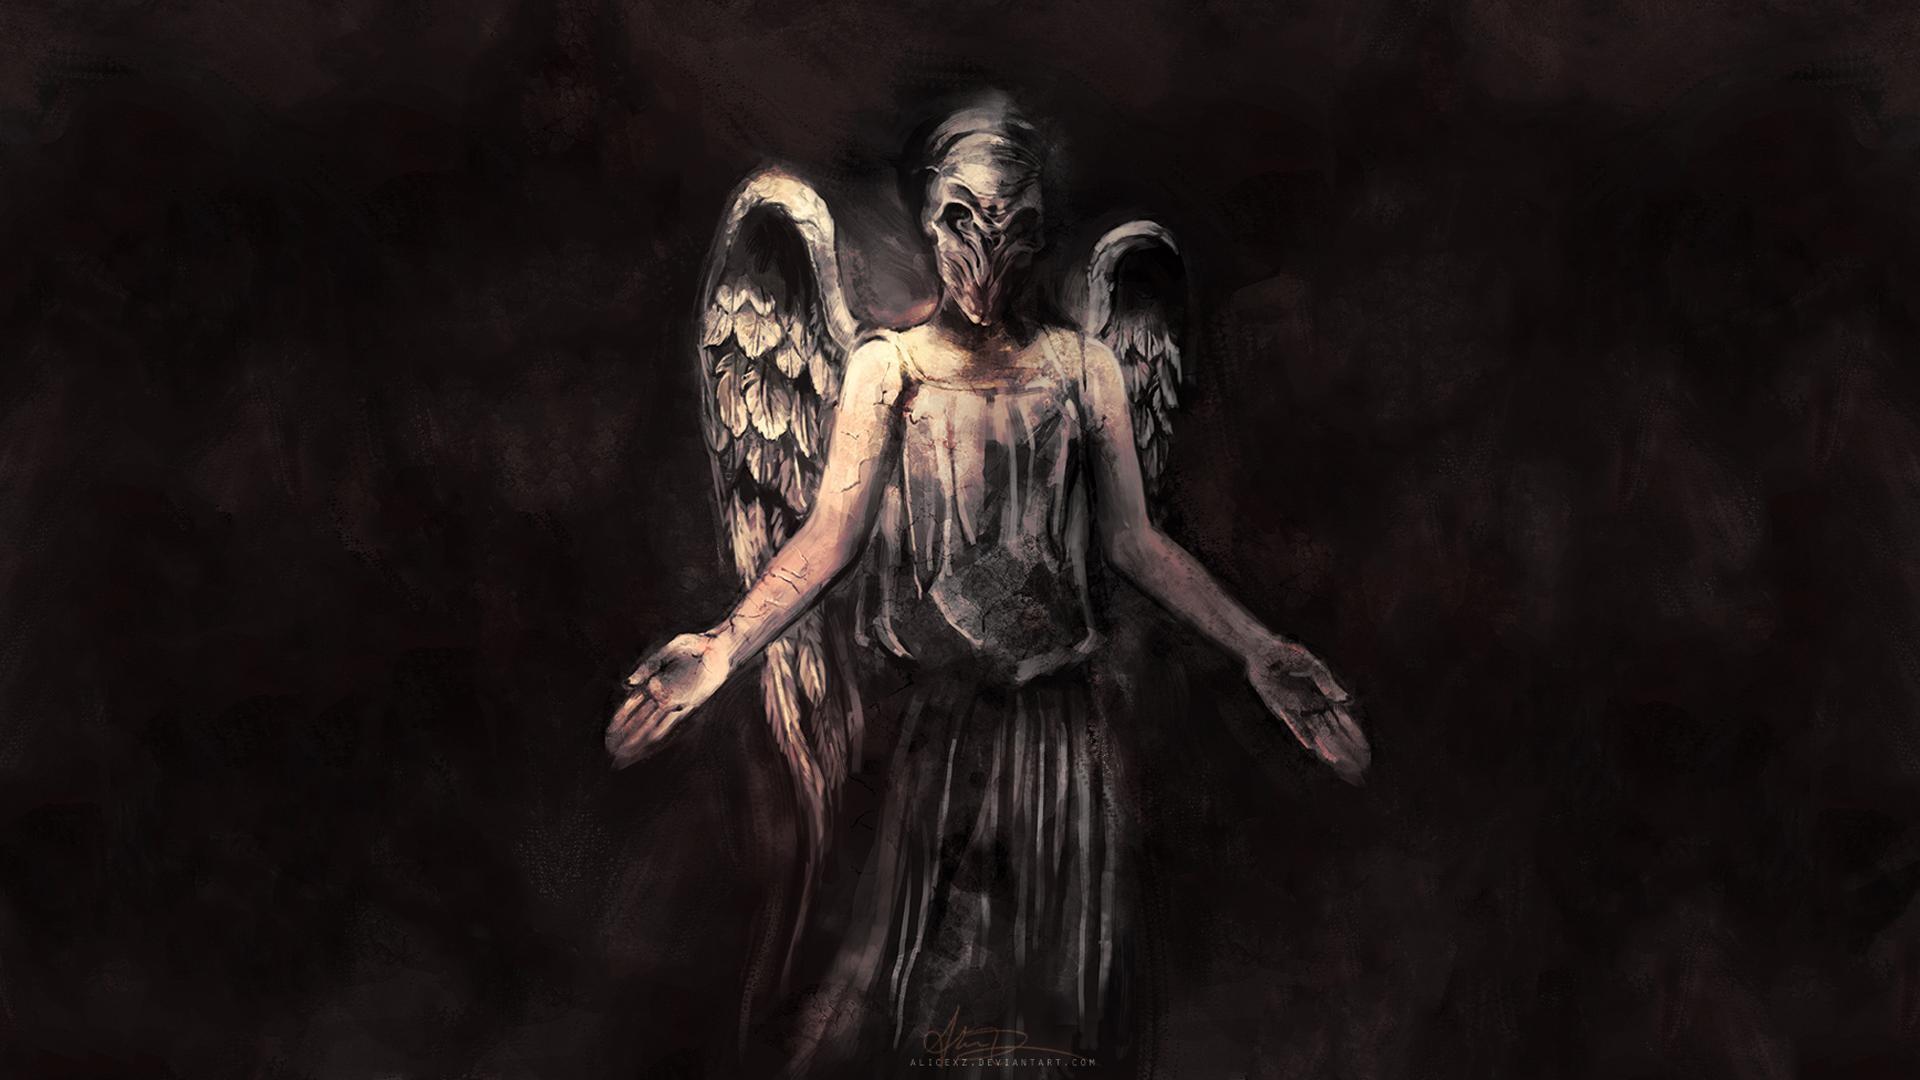 Doctor Who The Silence angels dark fallen wings fantasy evil scary spooky  creepy horror fantasy mask art wallpaper